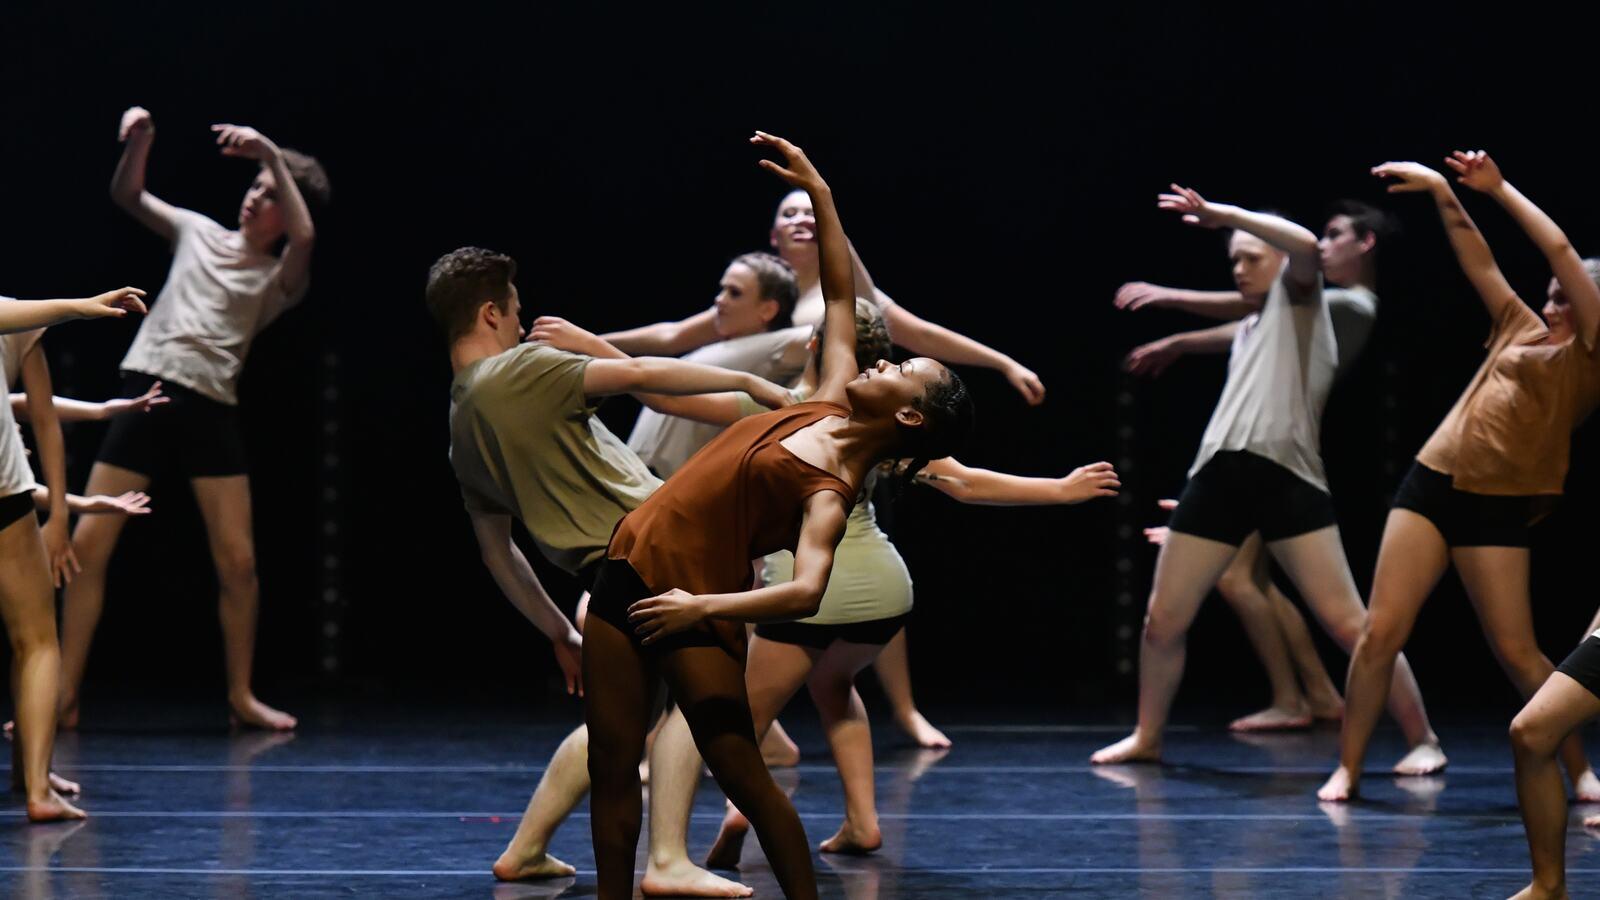 U. Dance Showcase, youth dancers performing